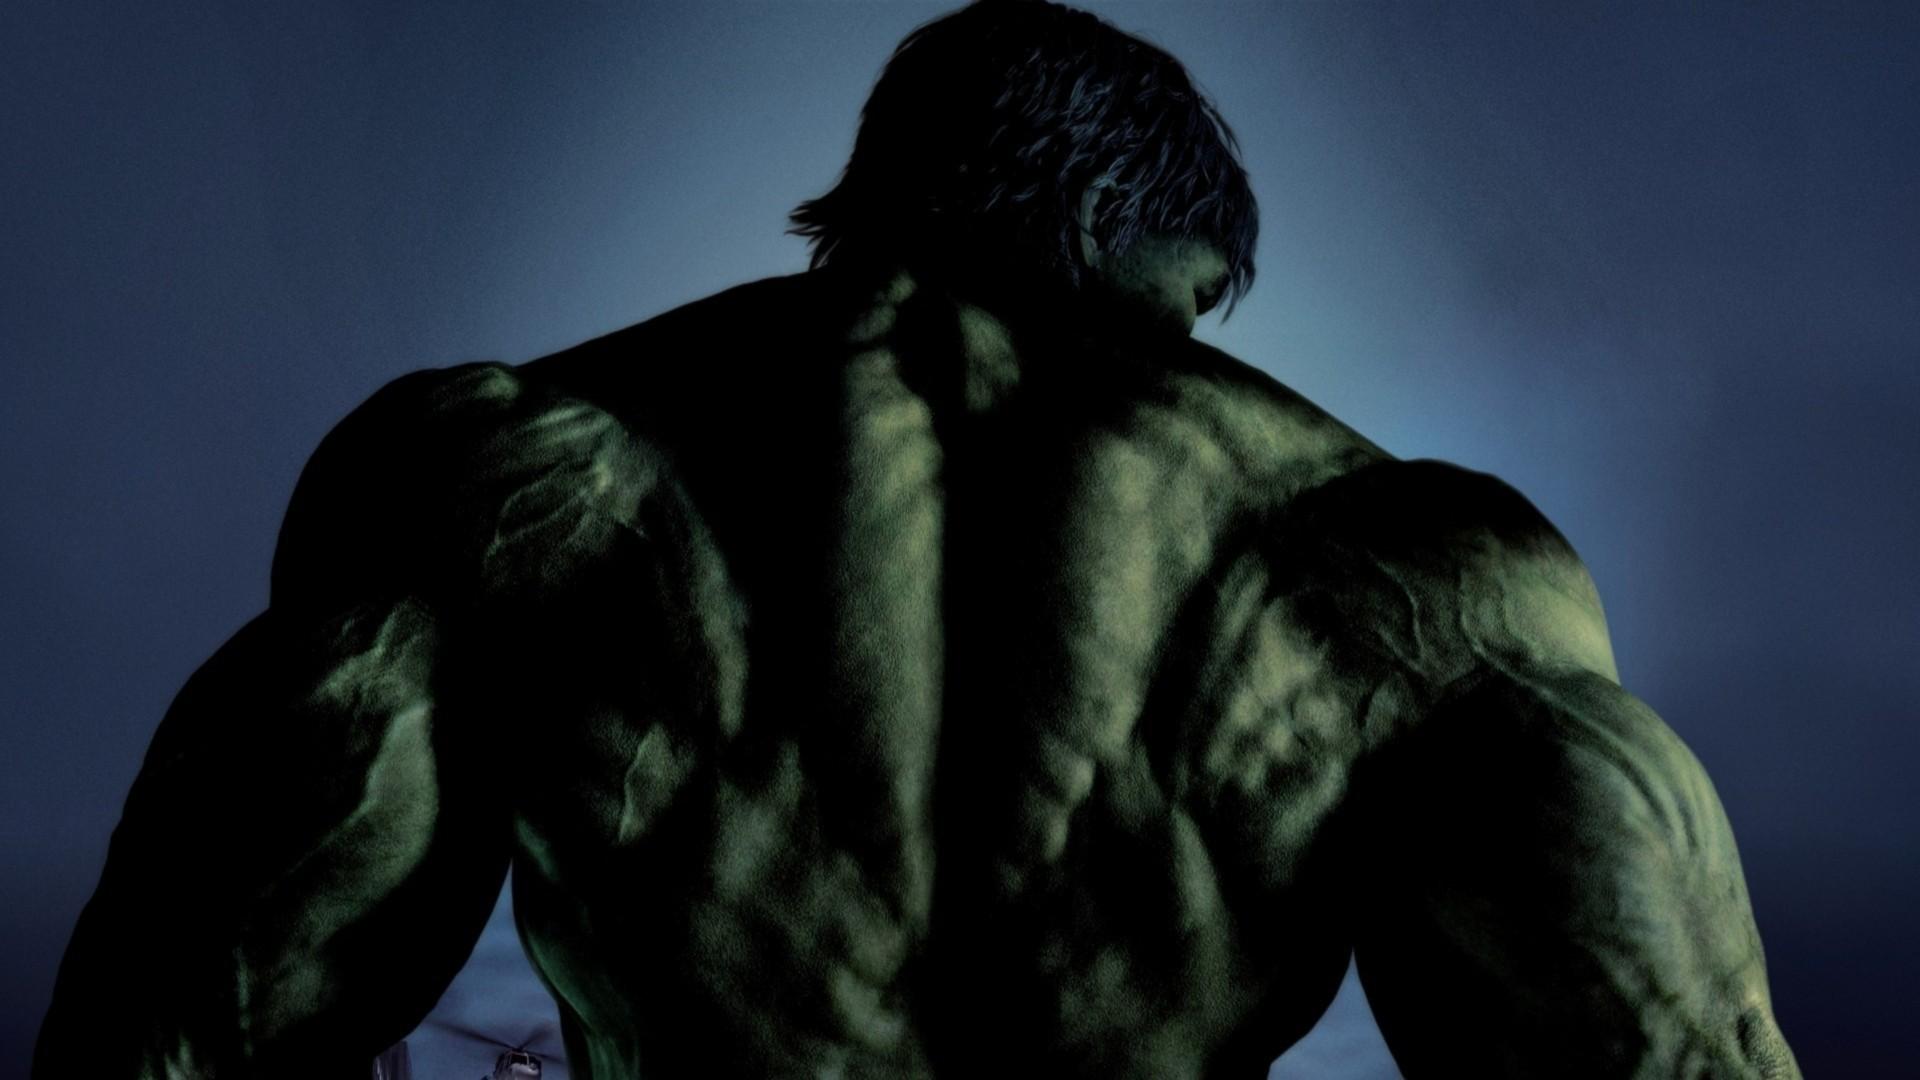 justpict.com Avengers Wallpaper Hulk